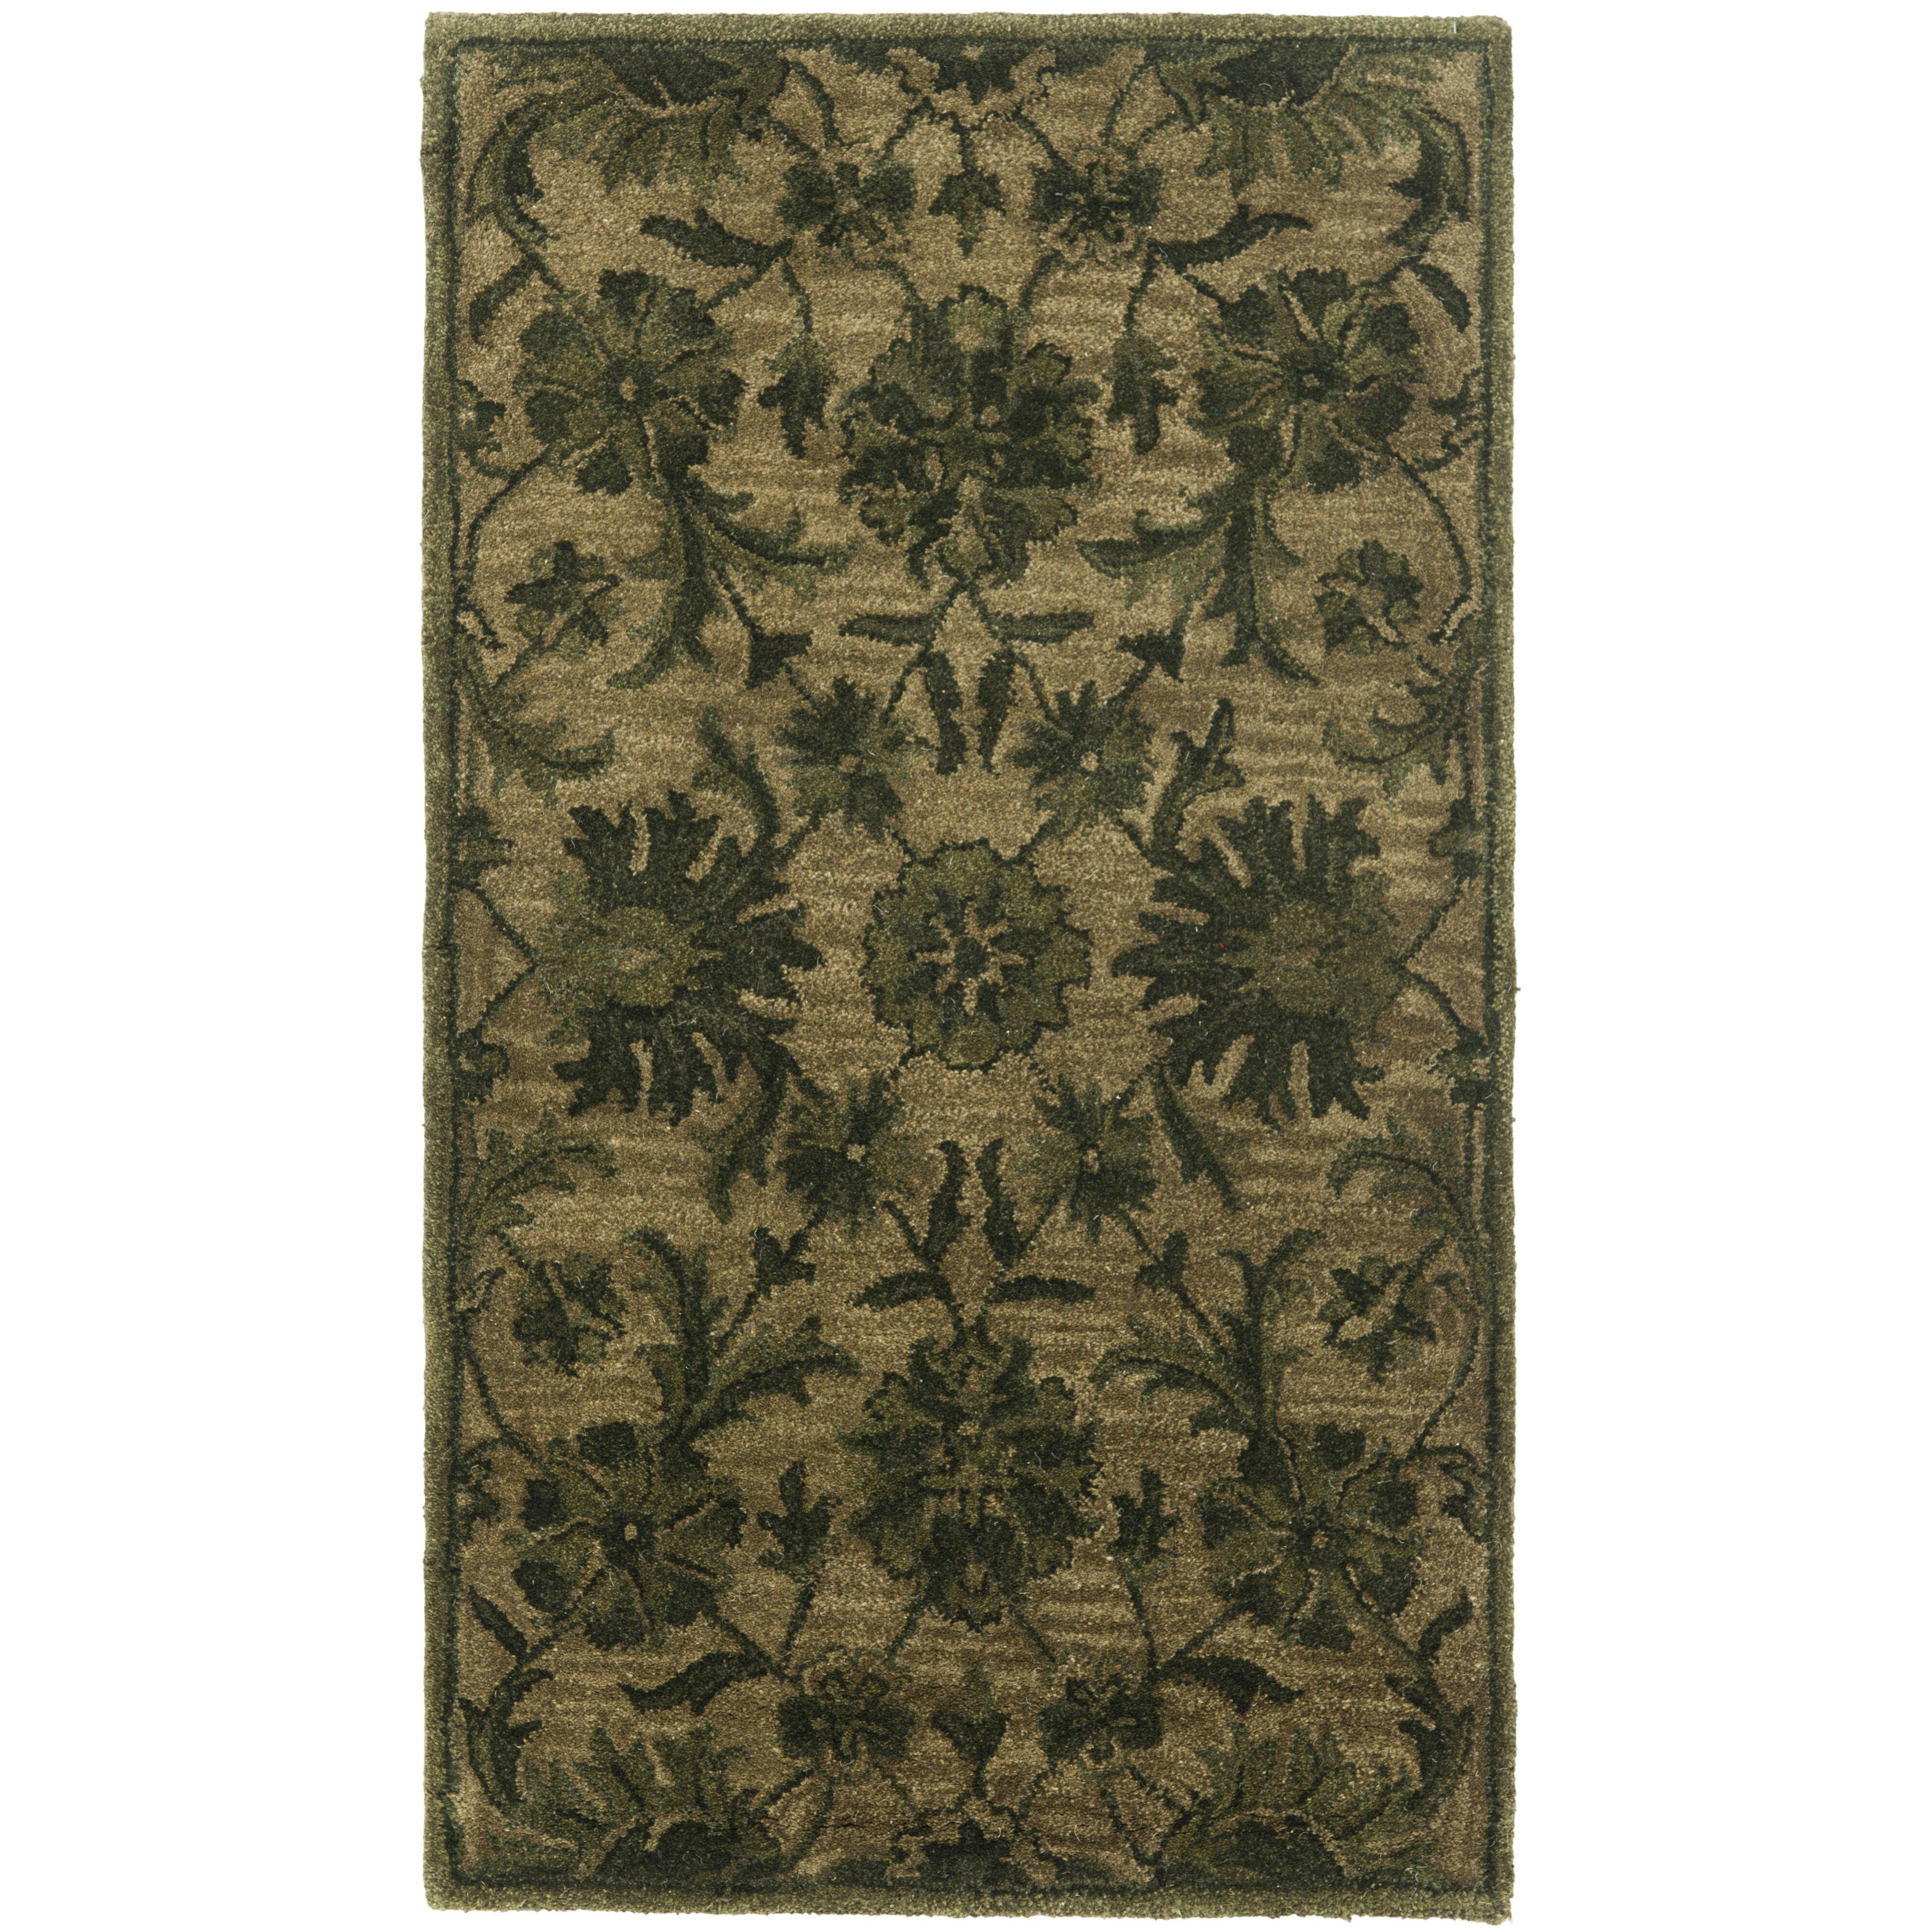 Charlton Home Dunbar Olive/Green Area Rug & Reviews